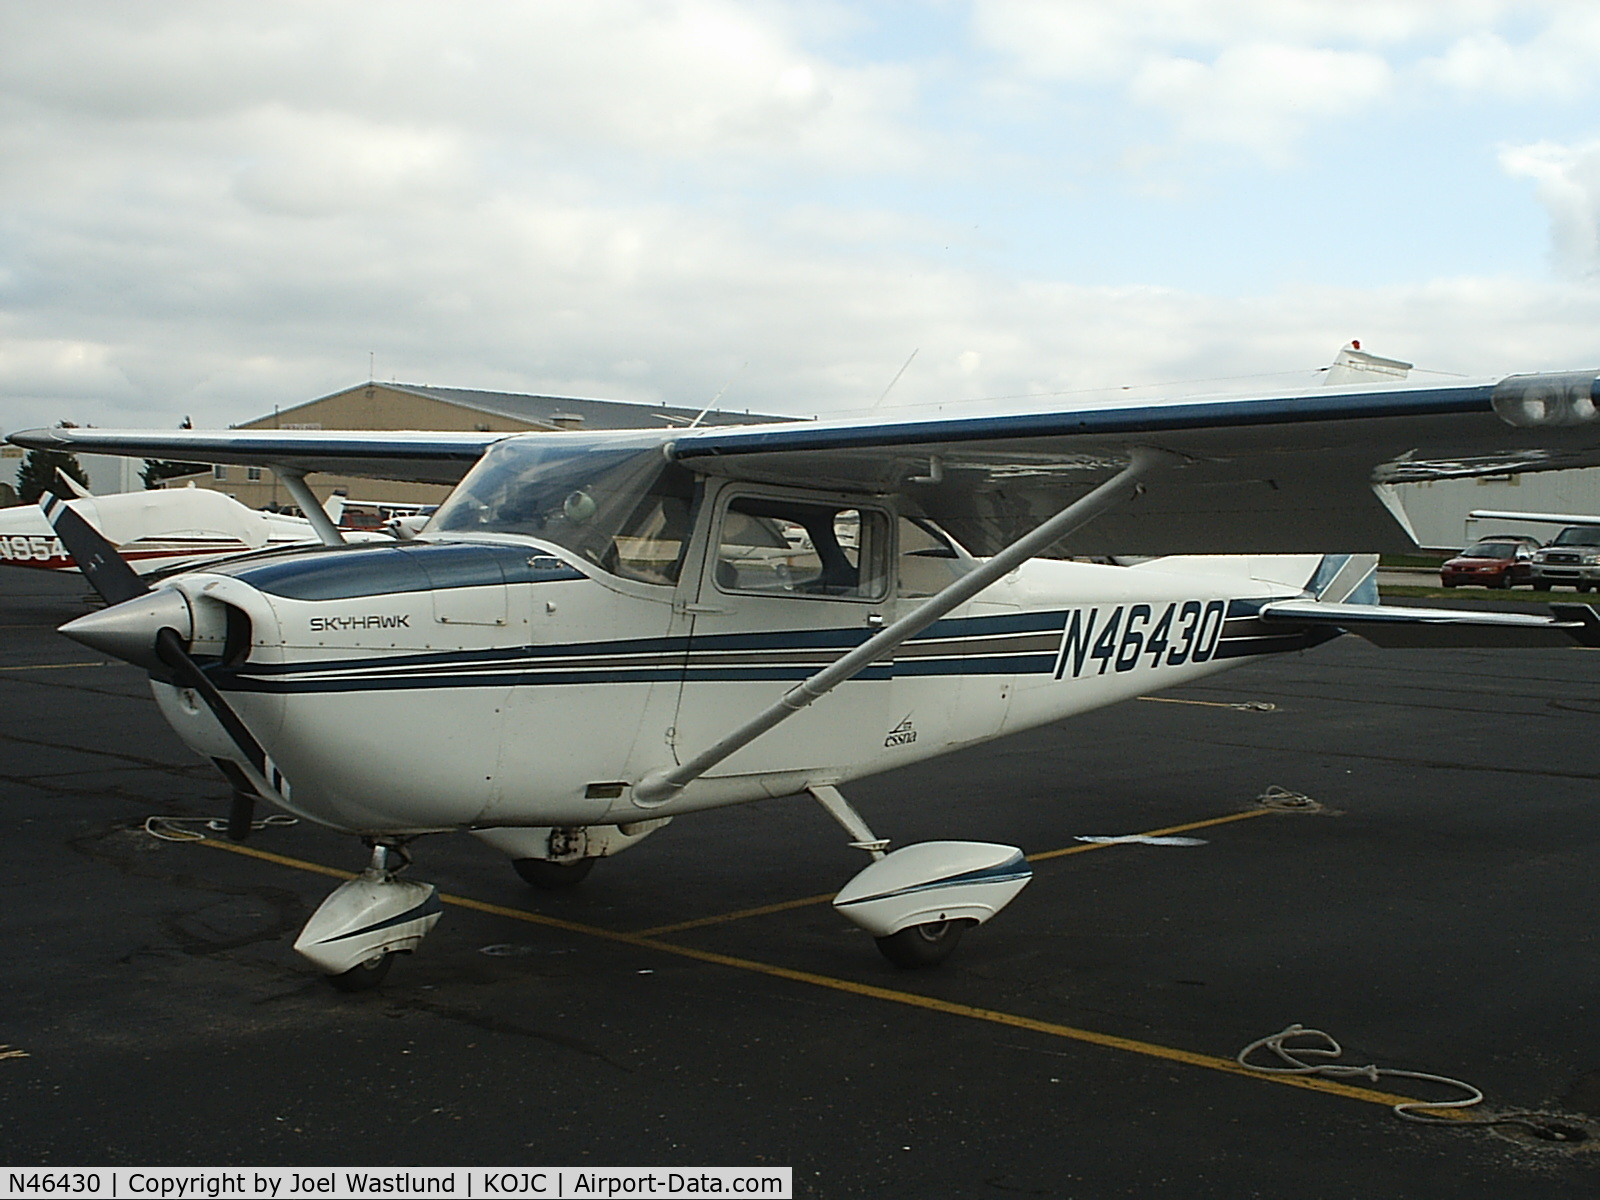 N46430, 1968 Cessna 172K Skyhawk C/N 17257263, A very good airplane for primary training.